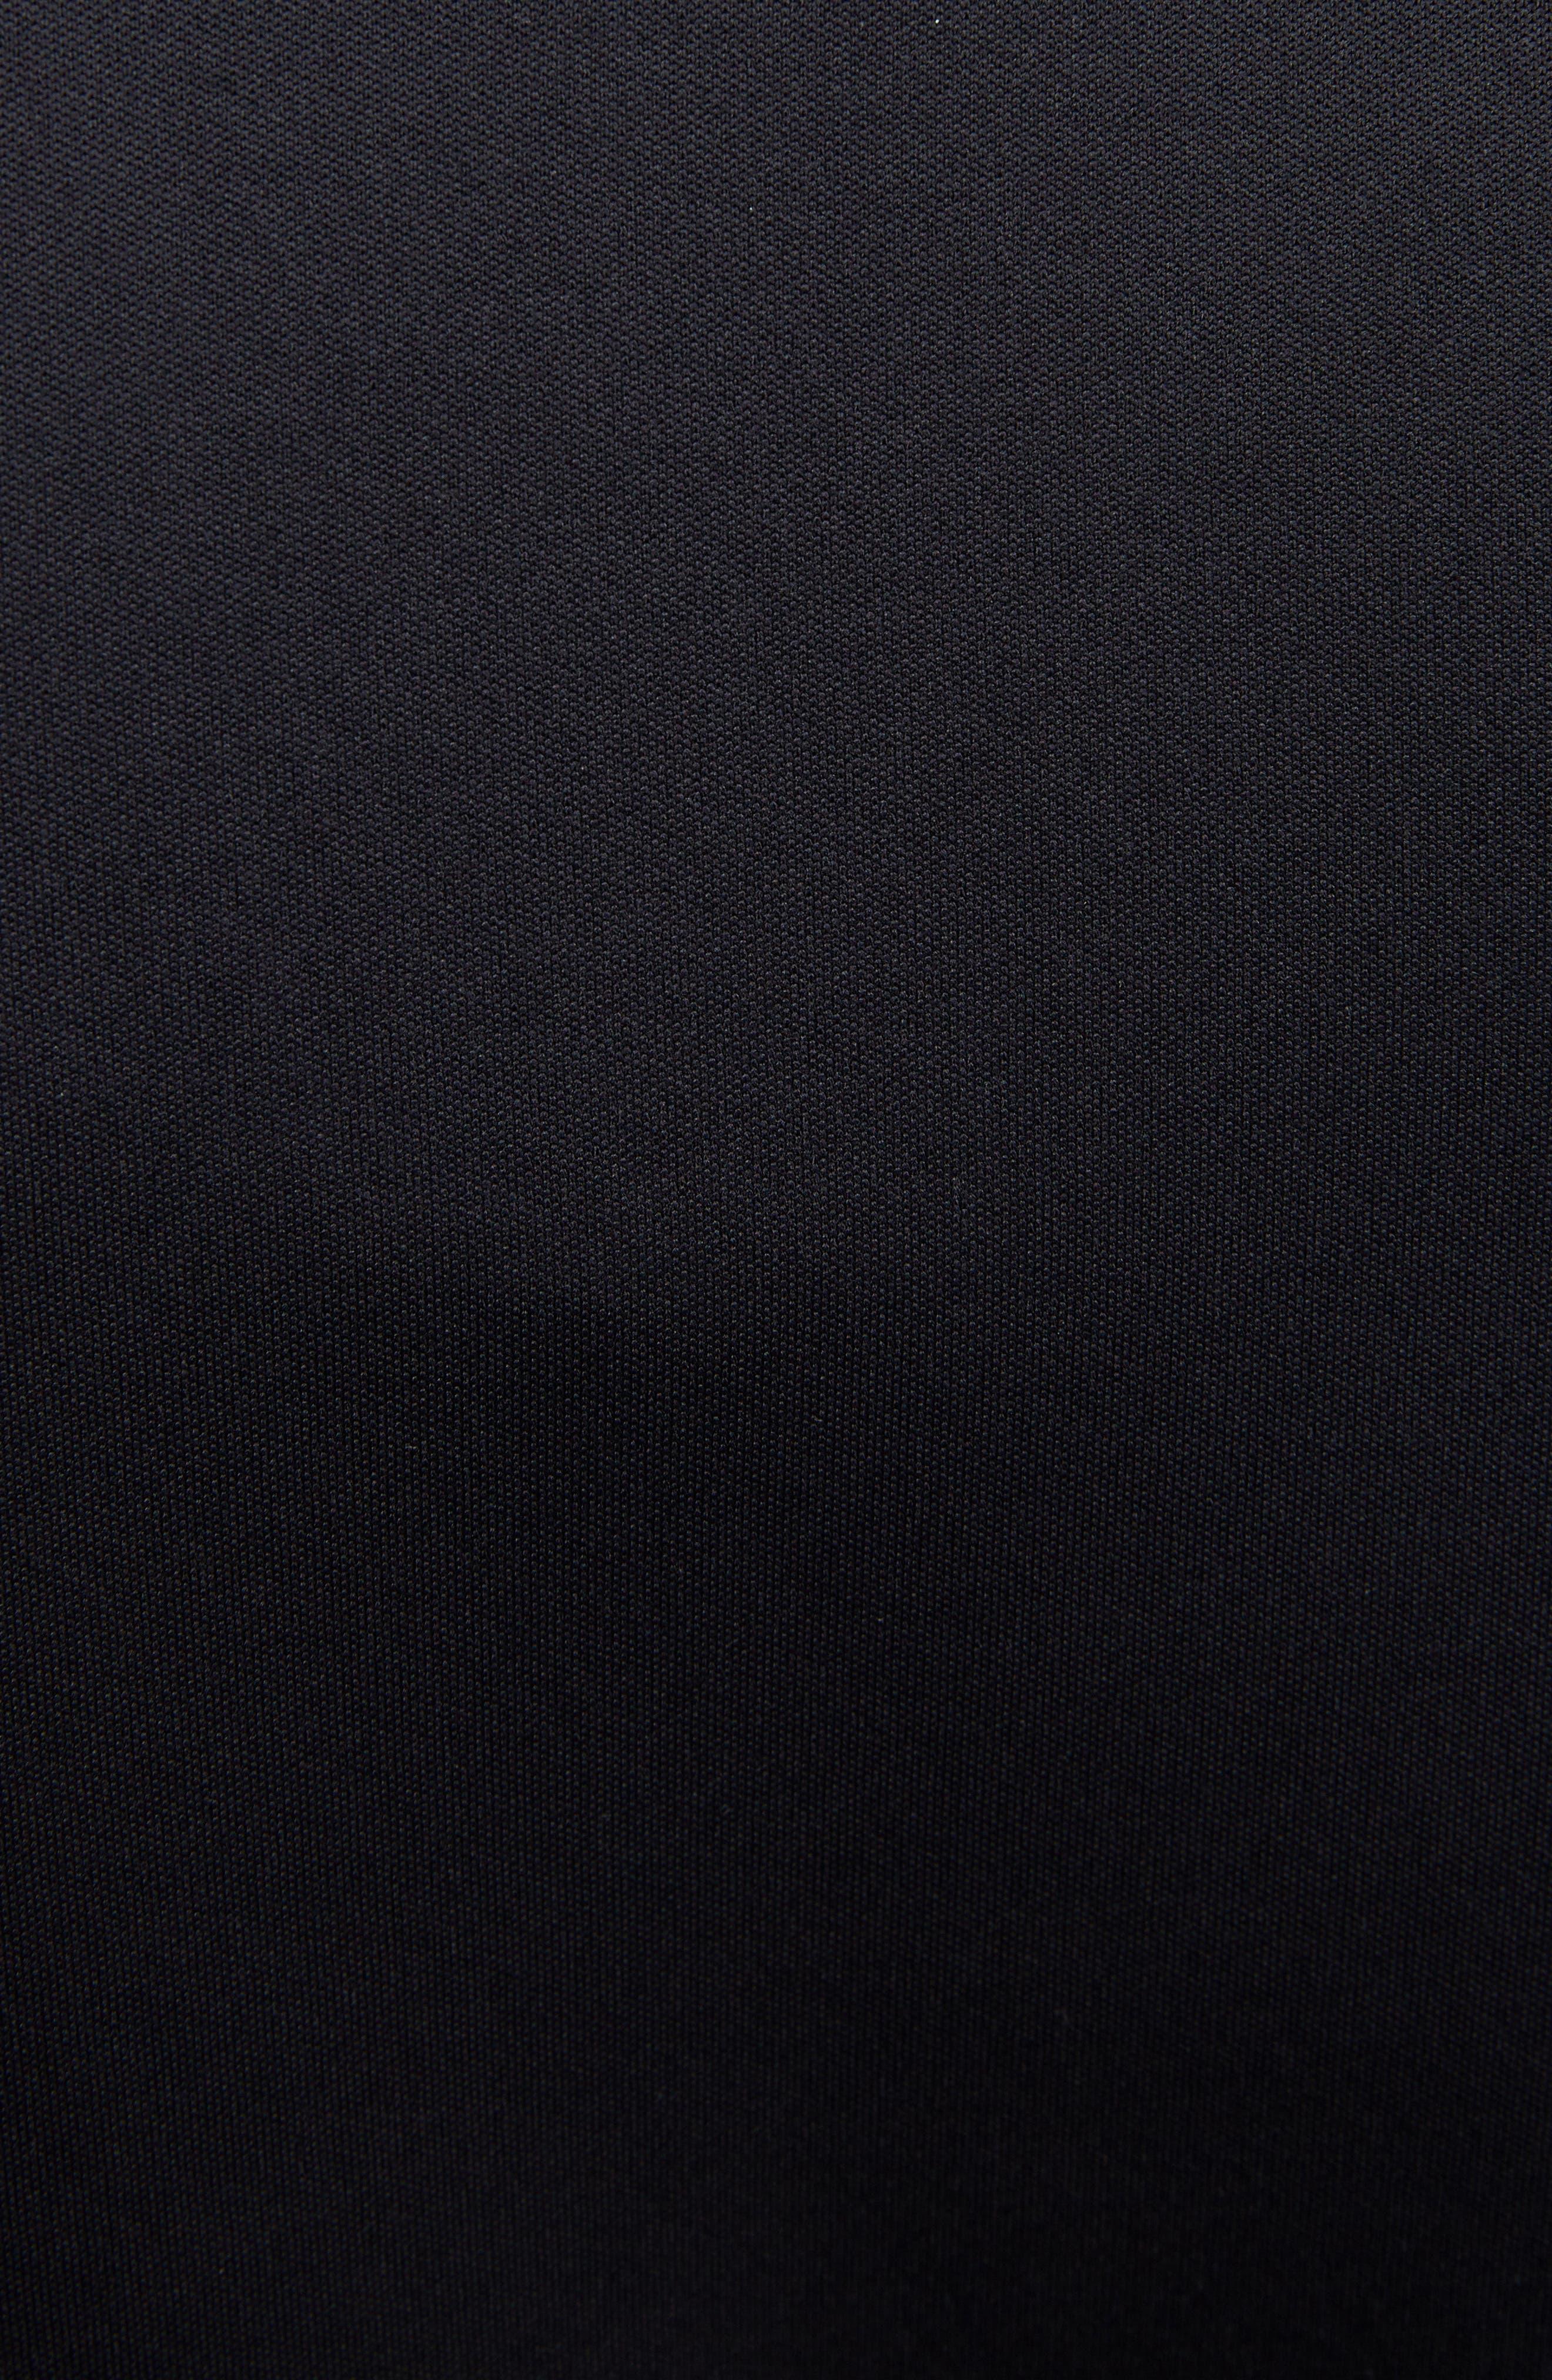 KENZO, Zip Track Jacket, Alternate thumbnail 5, color, BLACK